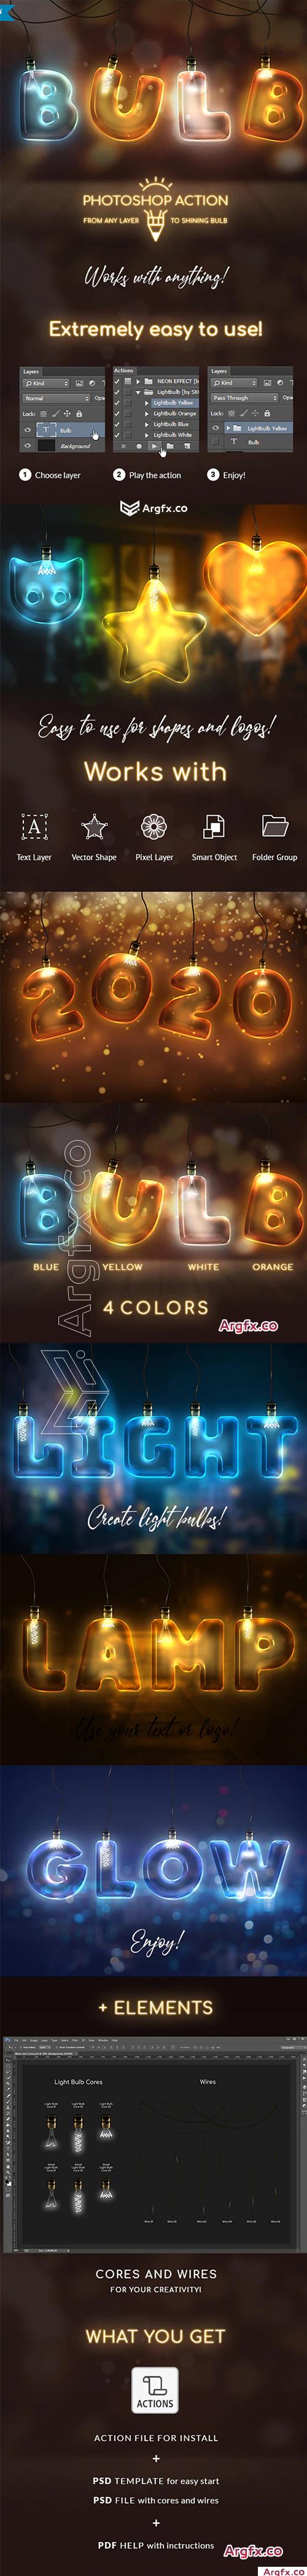 GraphicRiver - Light Bulb - Photoshop Action 25602135